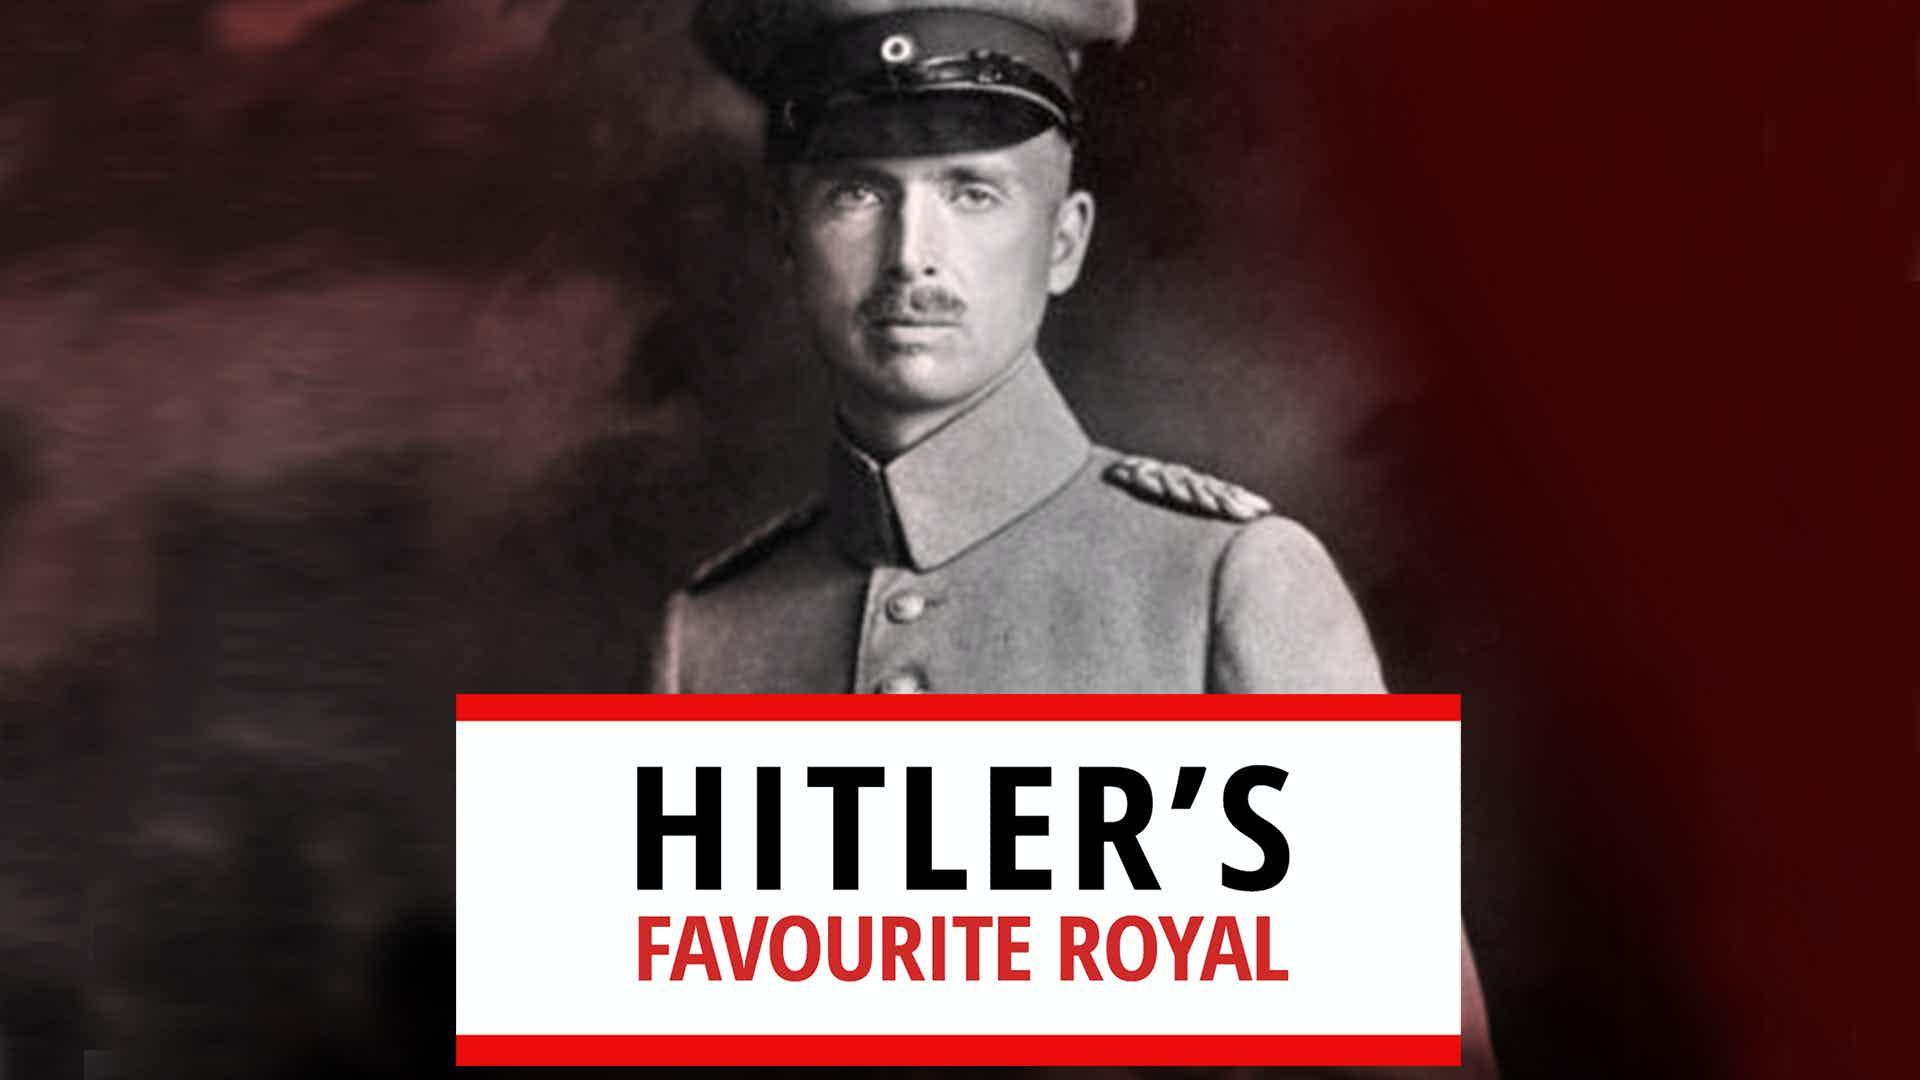 Hitler's Favourite Royal